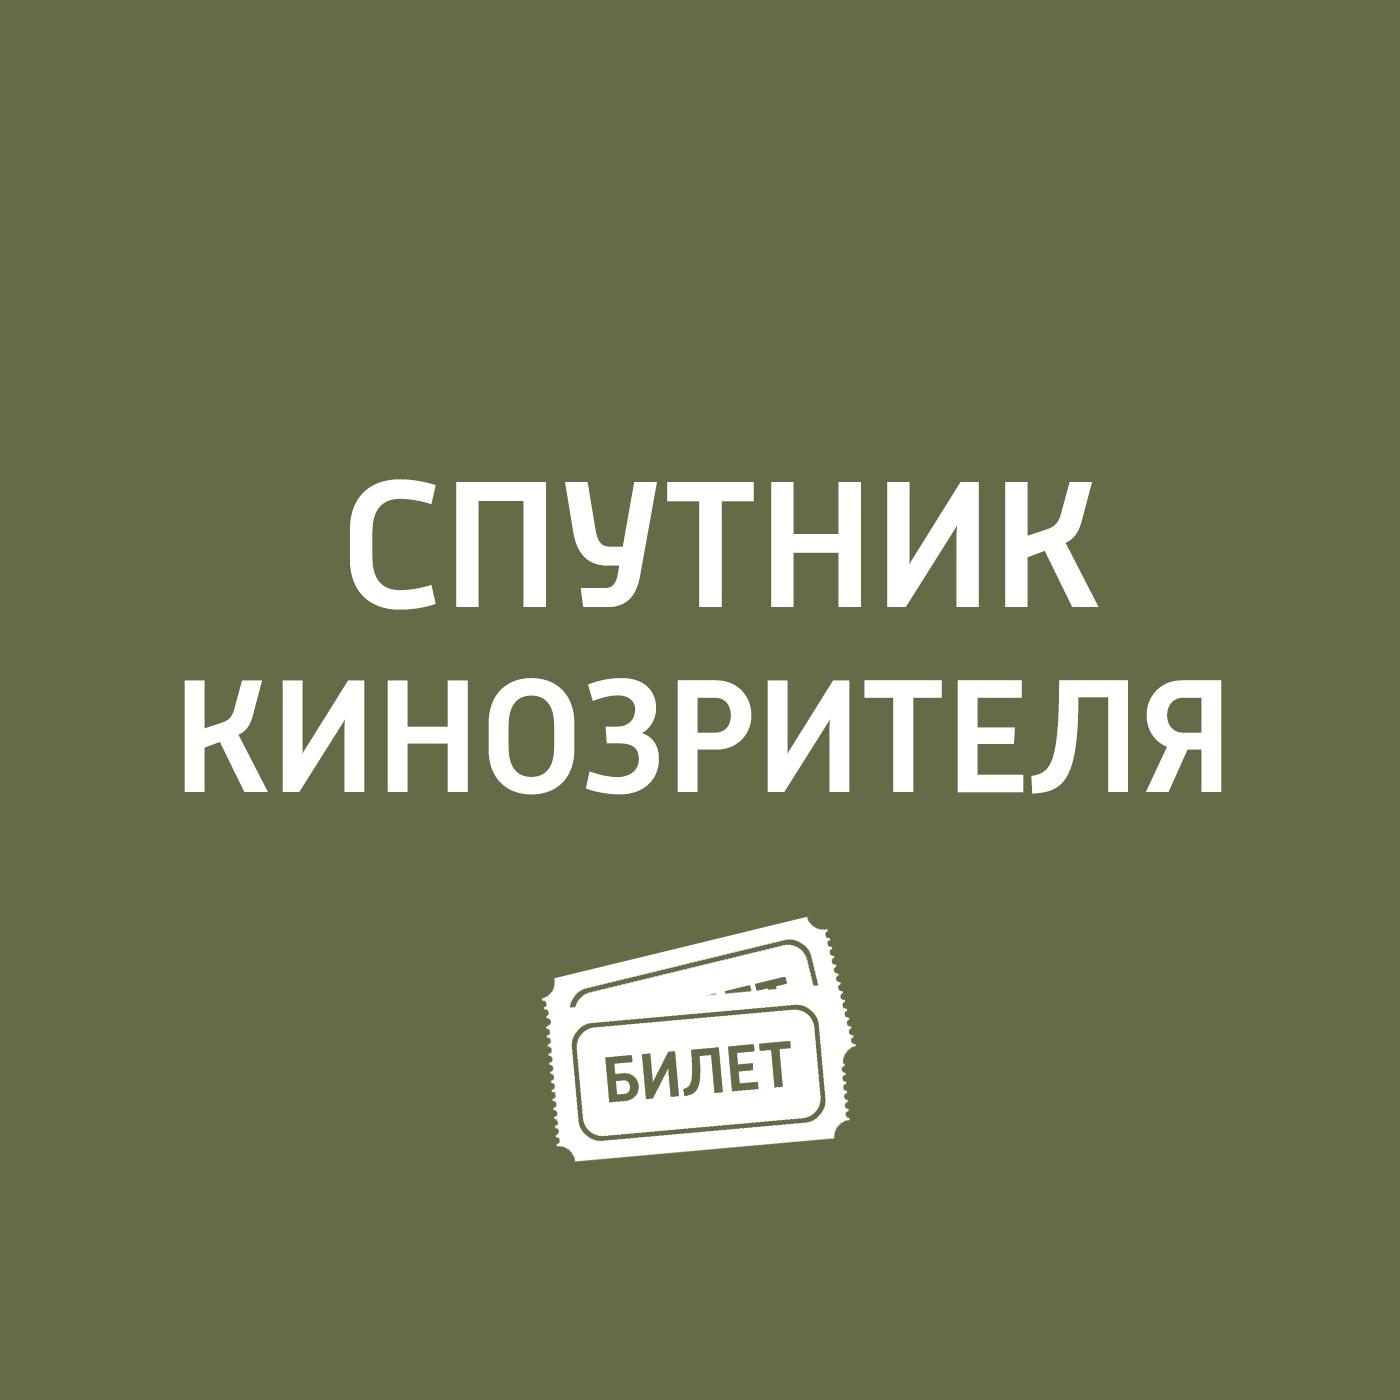 Антон Долин Вспоминаем кинотворчество Романа Карцева и Шарля Азнавура